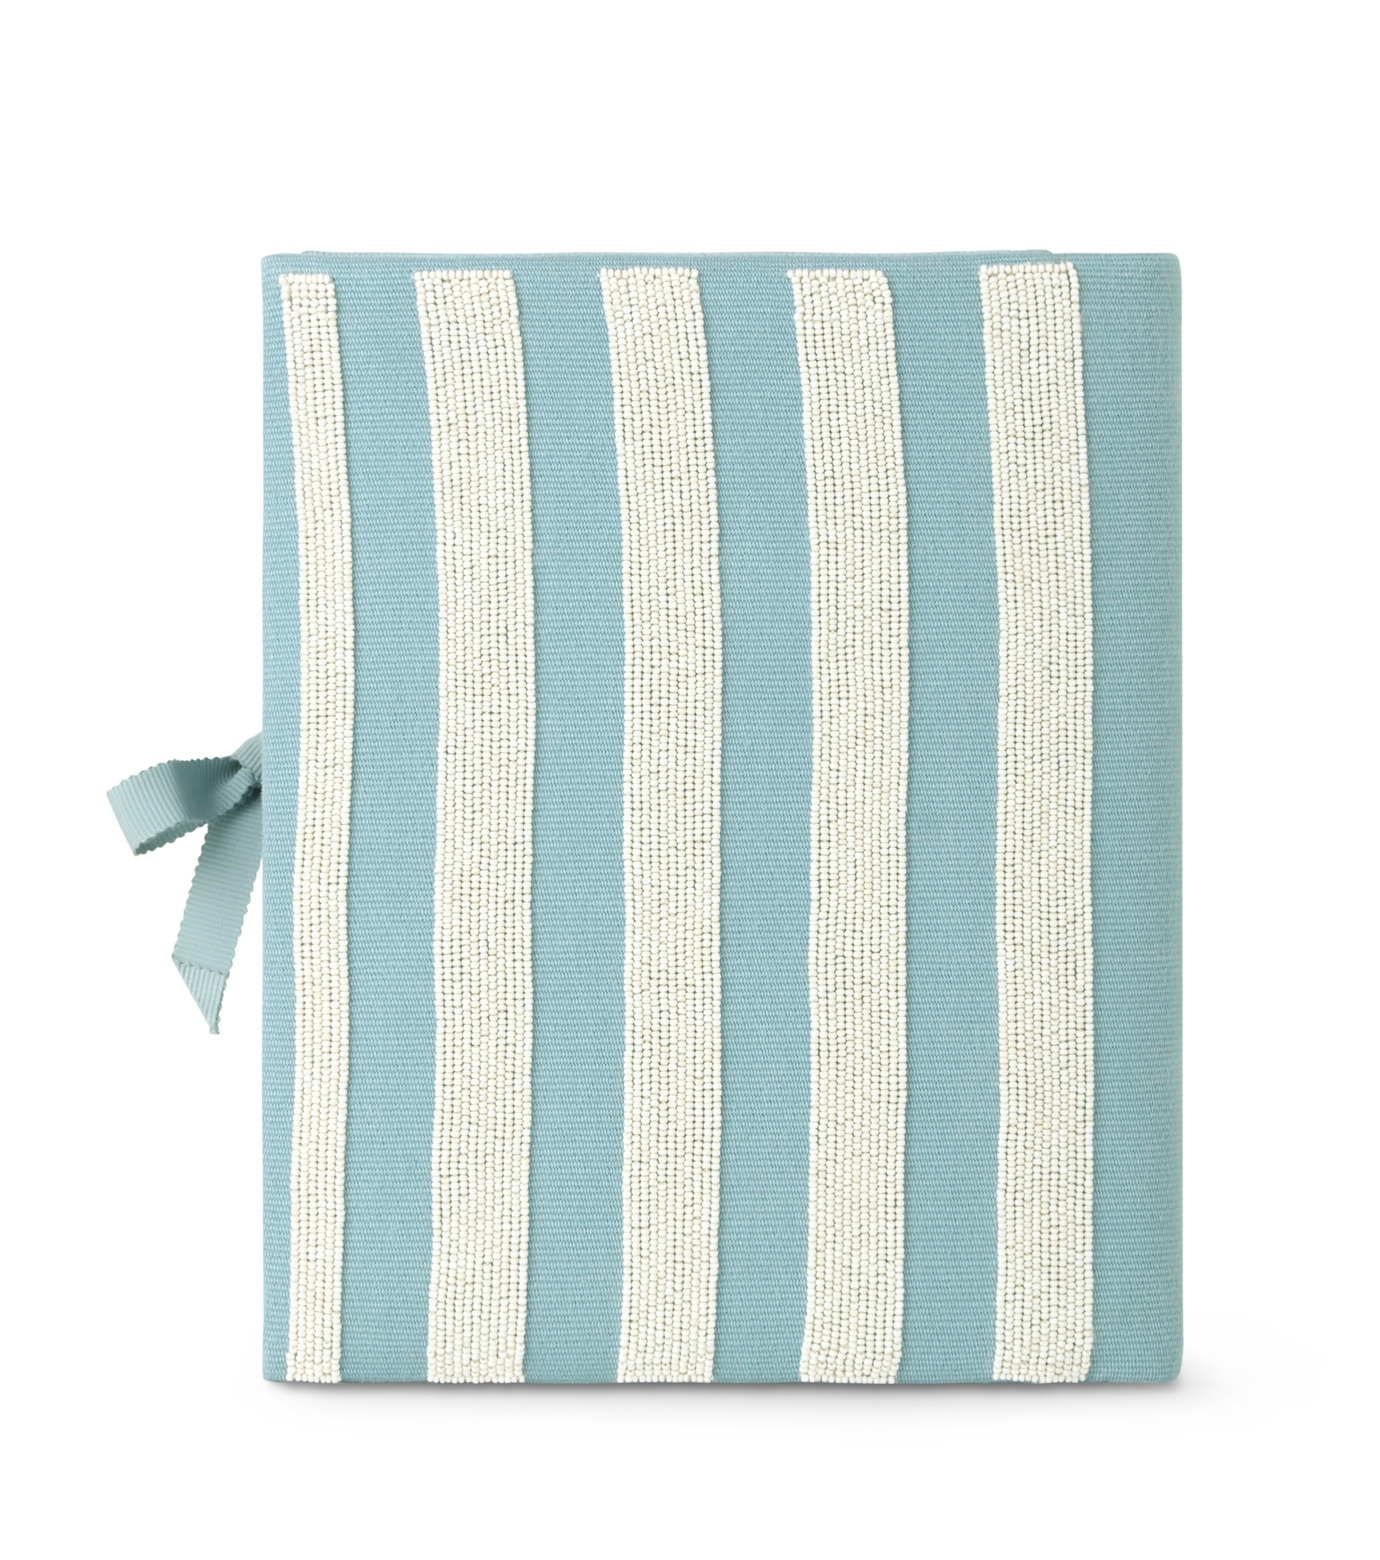 Olympia Le-Tan(オリンピア ルタン)のNotebook Clutch Alice-LIGHT BLUE(クラッチバッグ/clutch bag)-RE16BN001-91 拡大詳細画像3